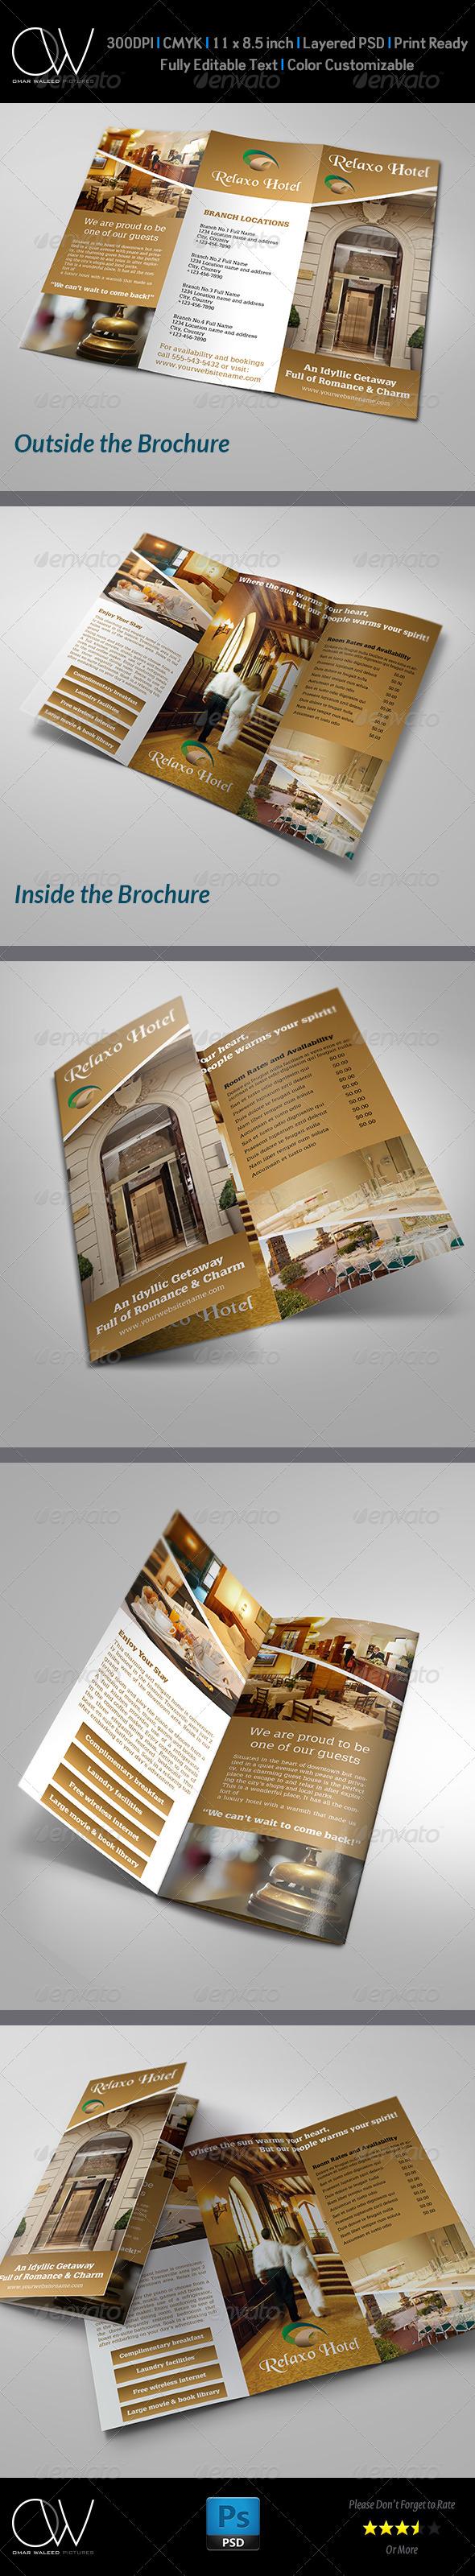 GraphicRiver Hotel and Motel Tri-Fold Brochure Template 5354750